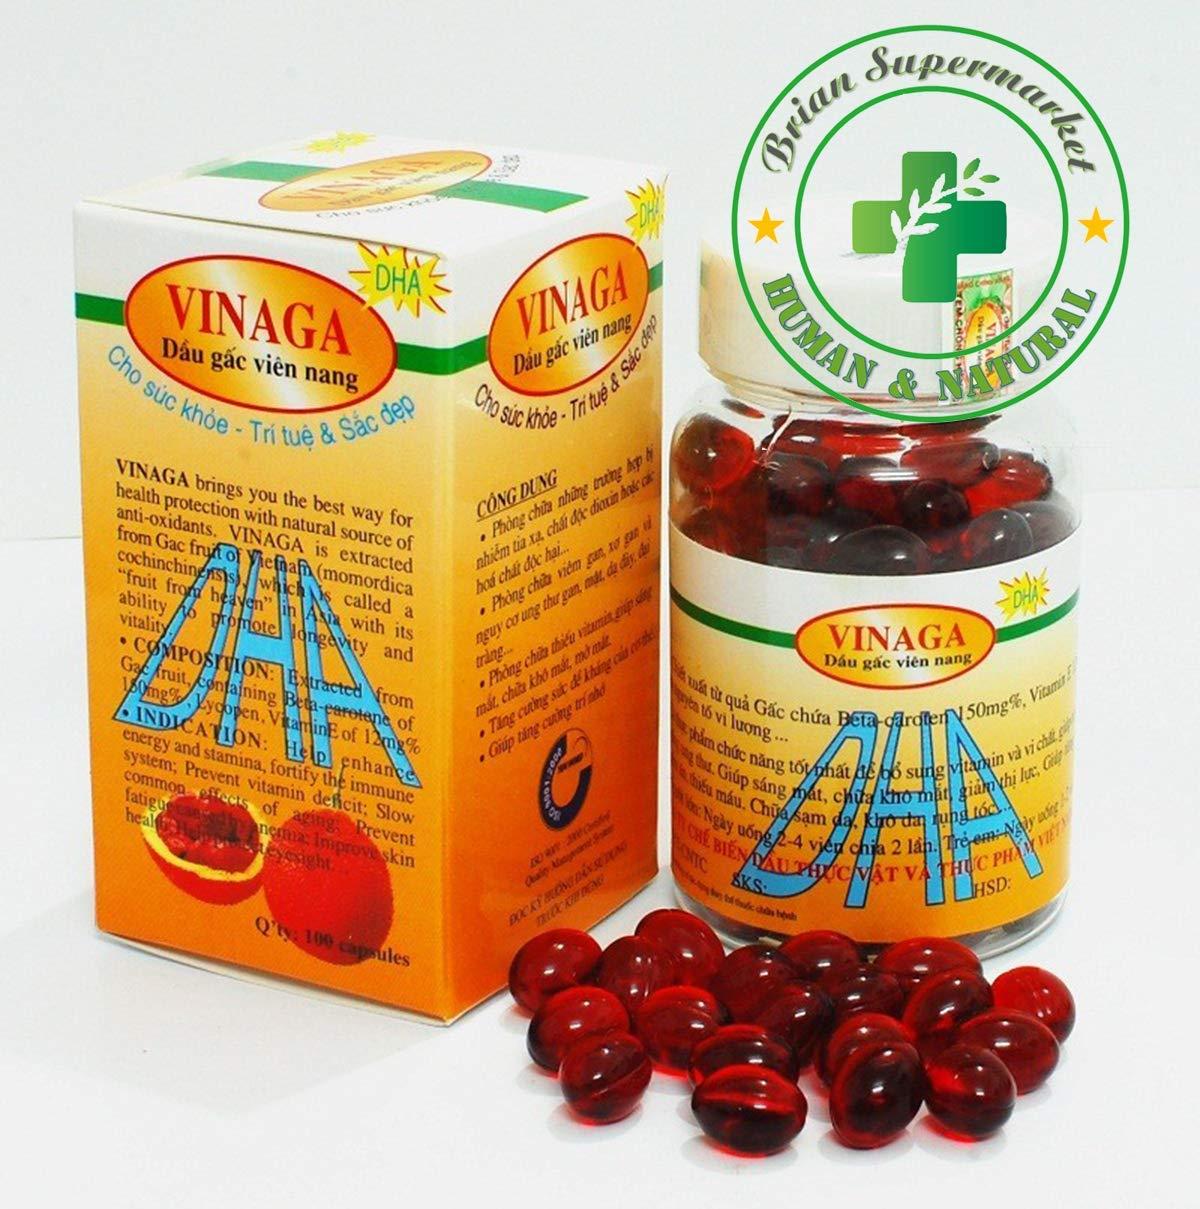 Amazon.com: Brian Supermarket - Vinaga DHA Pure GAC Oil - Momordica GAC Fruit Vitamin A Vitamin E - Anti-Aging. 500 Capsules: Health & Personal Care